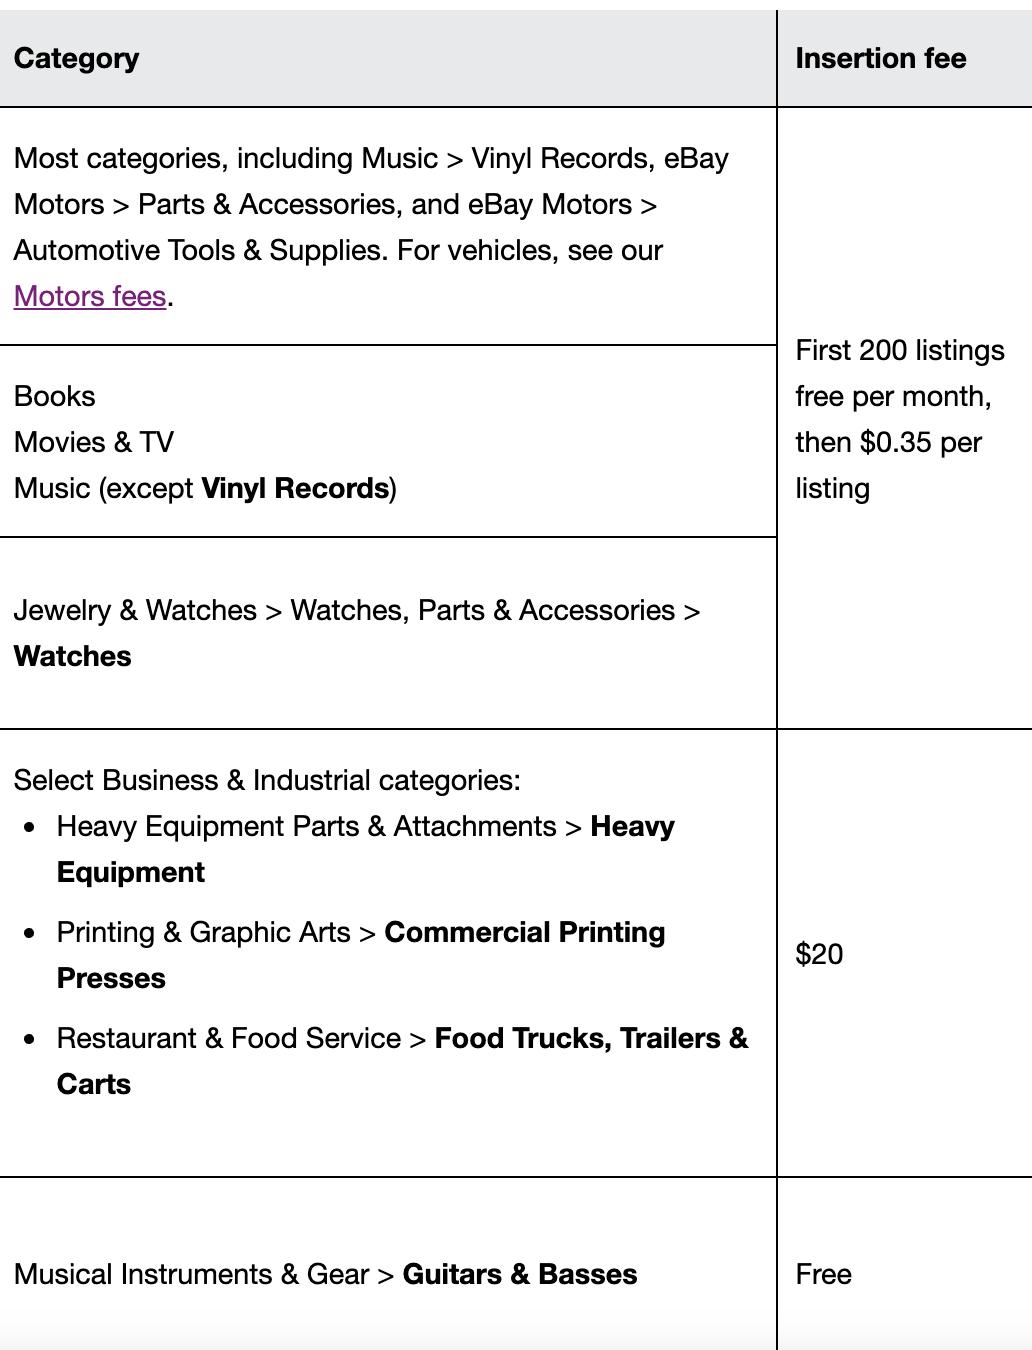 Fee categories